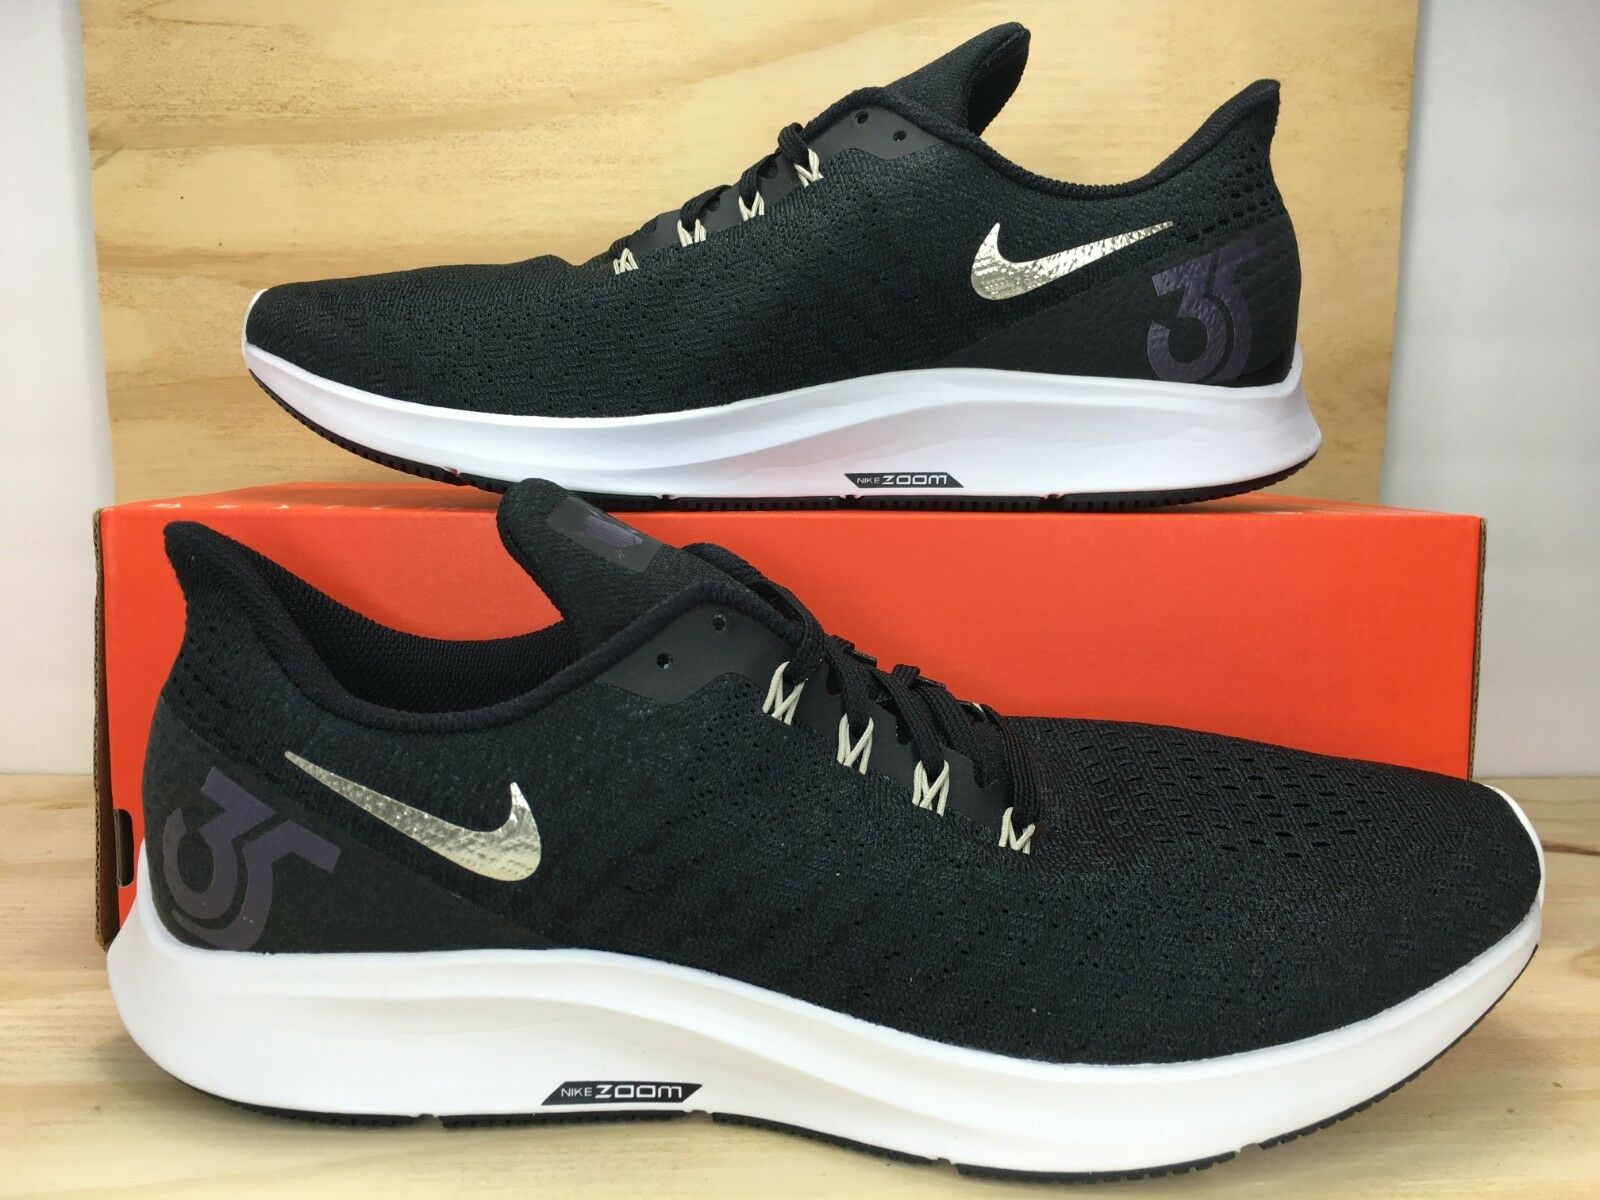 NIKE AIR ZOOM PEGASUS 35 ID Black White Men Running shoes Size 12 (AQ2792-991)